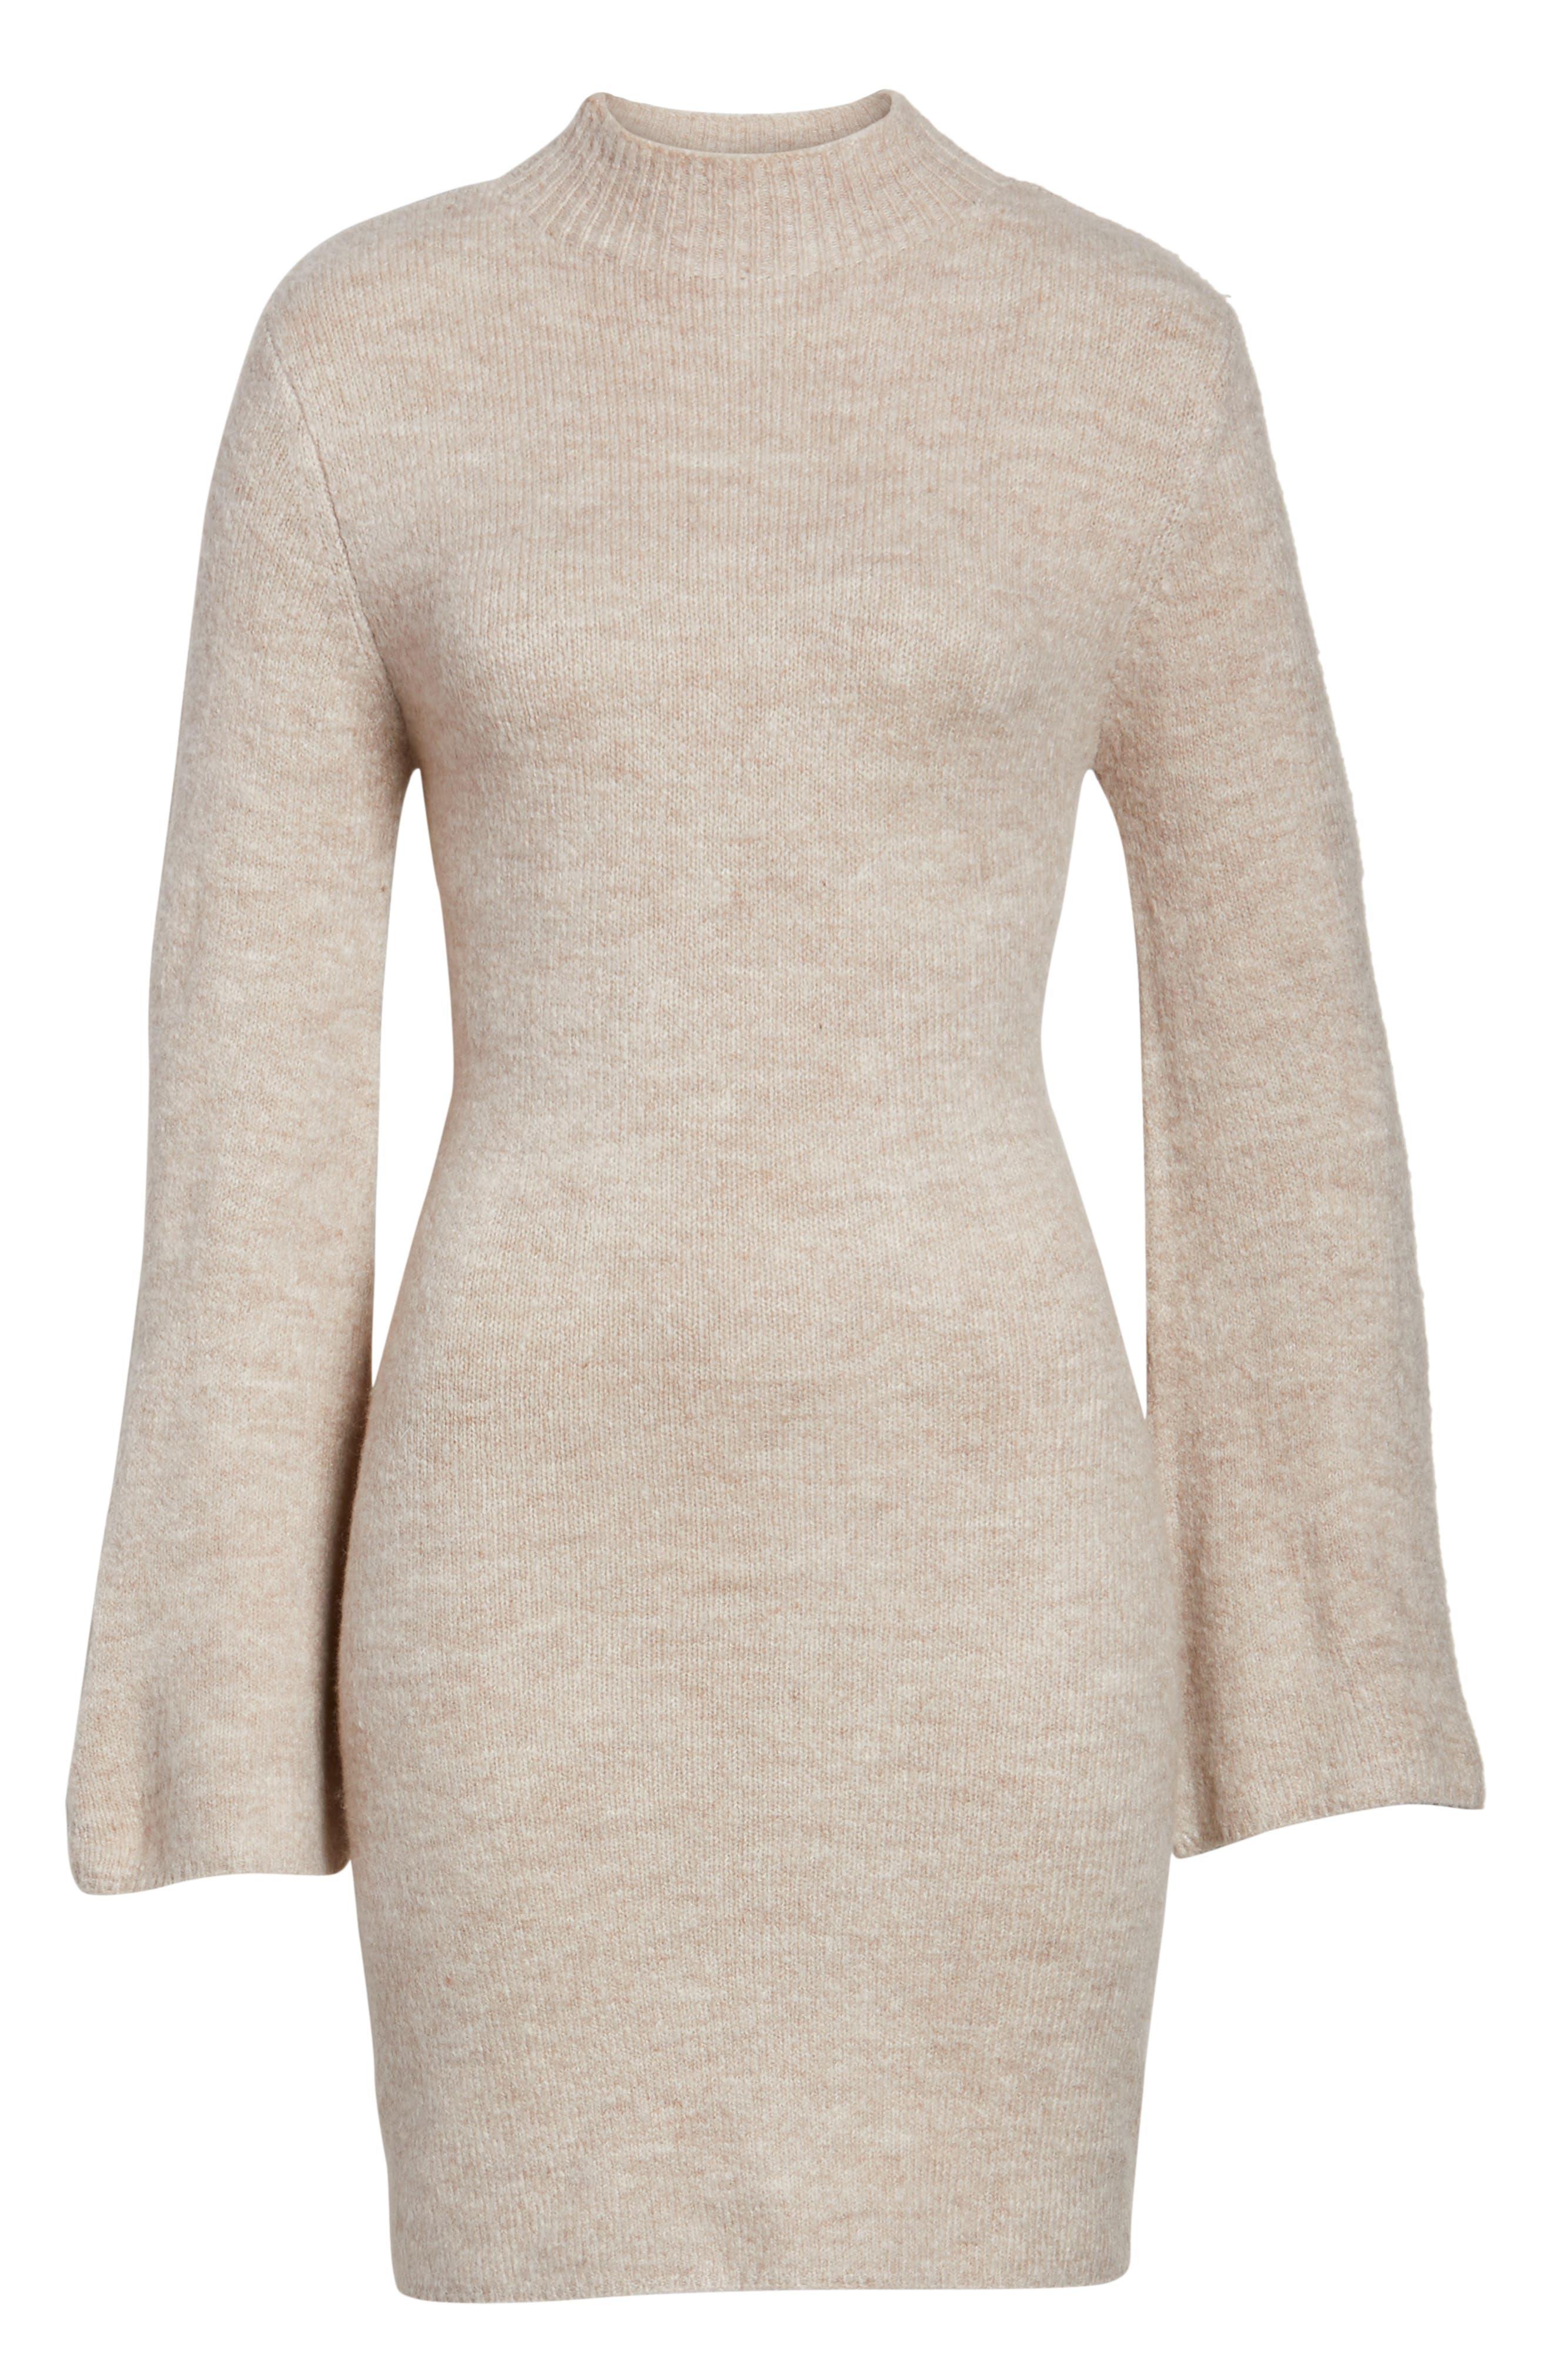 Bell Sleeve Knit Dress,                             Alternate thumbnail 12, color,